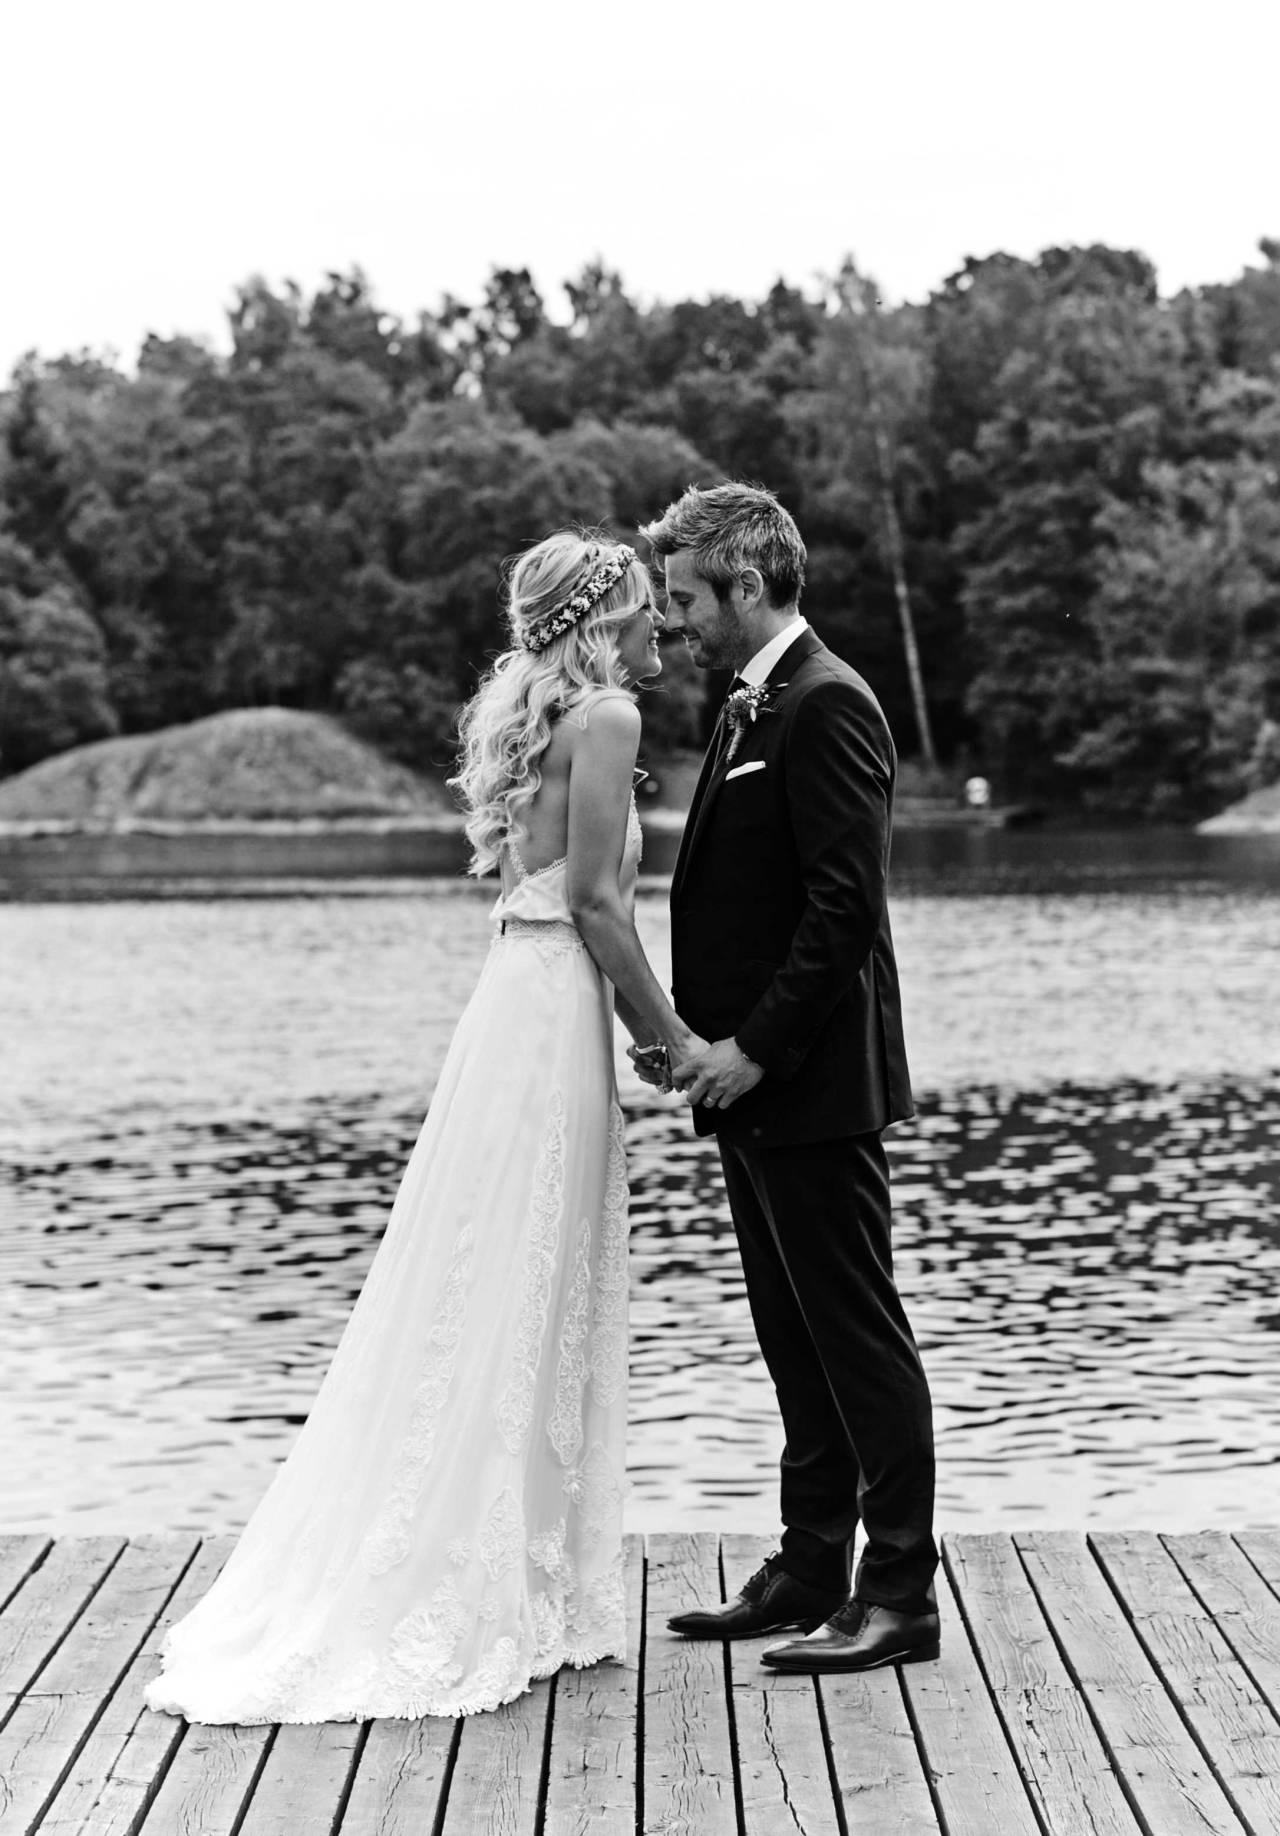 Lace hem boho wedding dress